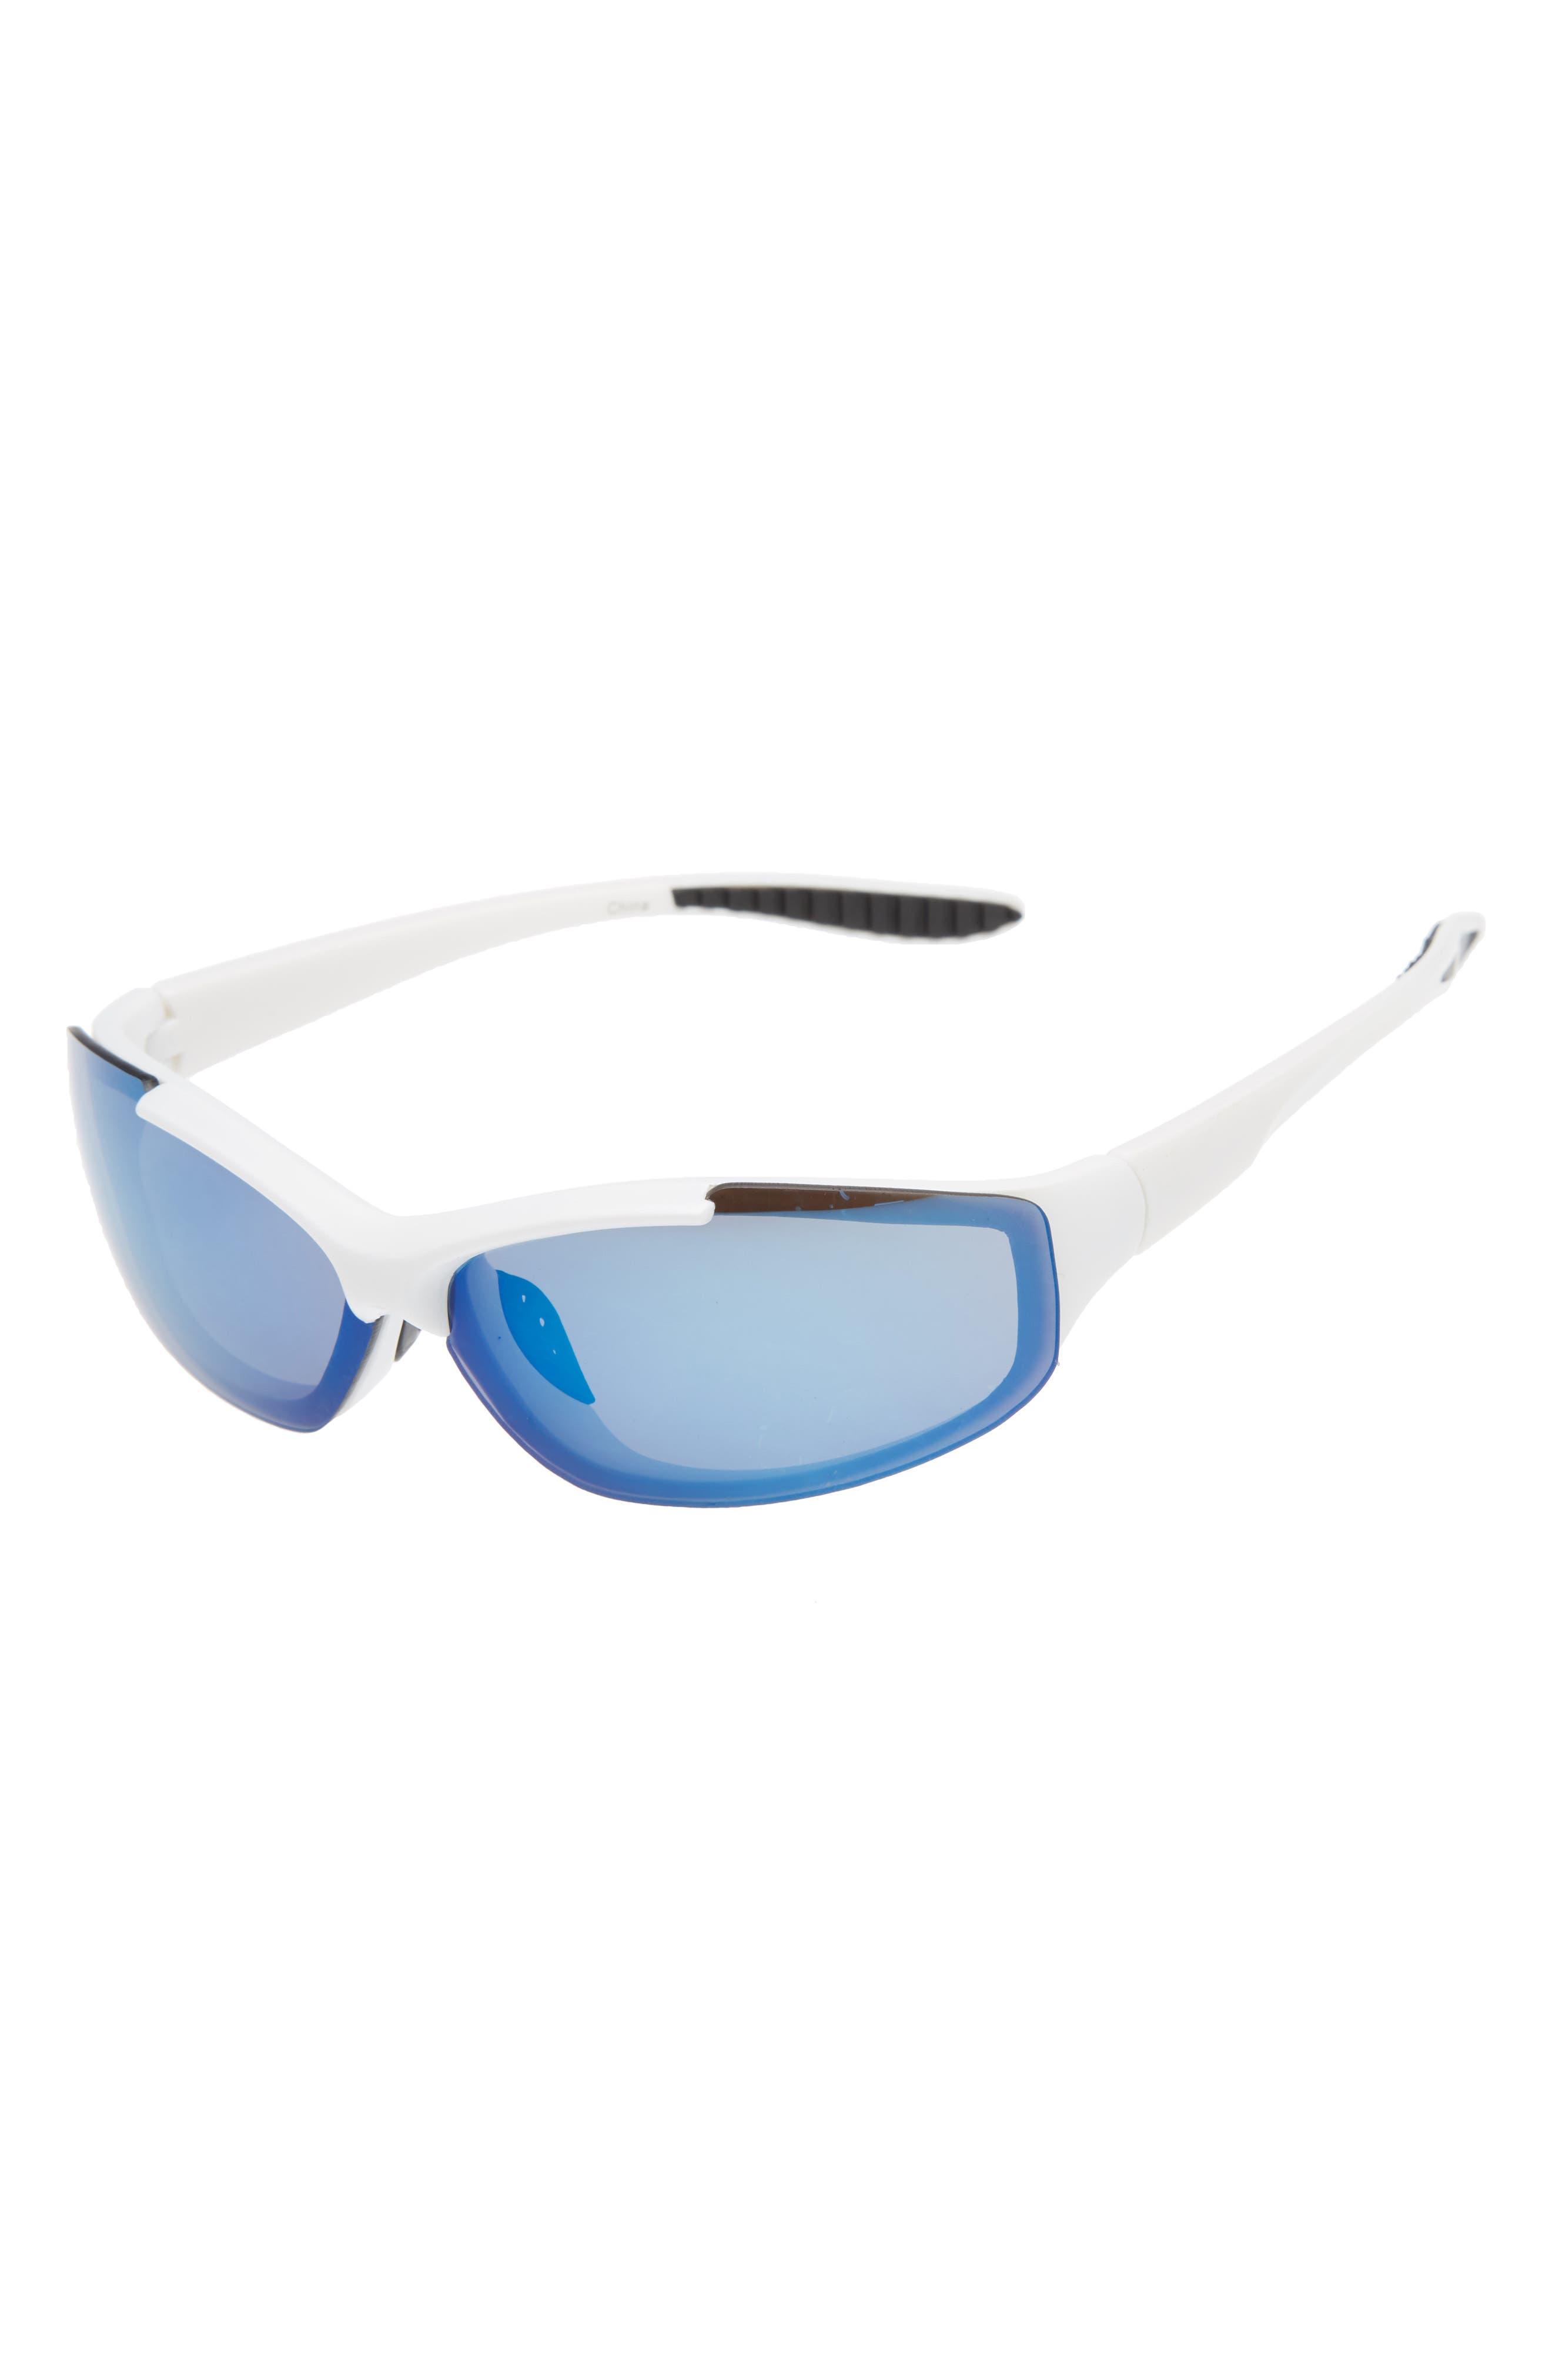 ICON EYEWEAR Semi Rimless Sunglasses